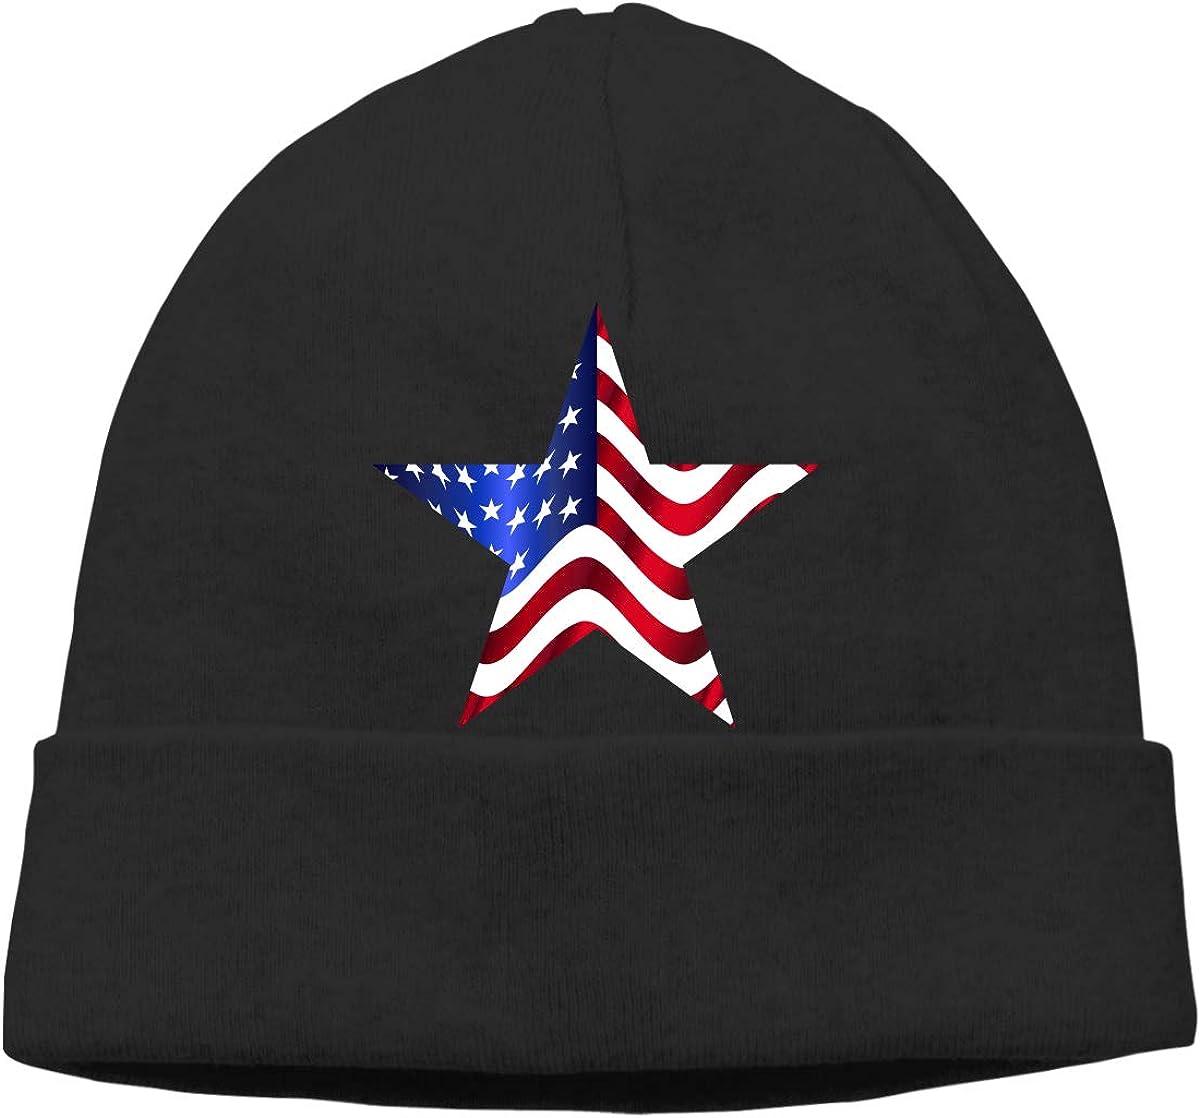 USA Star Unisex Cuffed Plain Skull Knitted Hat Beanie Cap Men Women Black